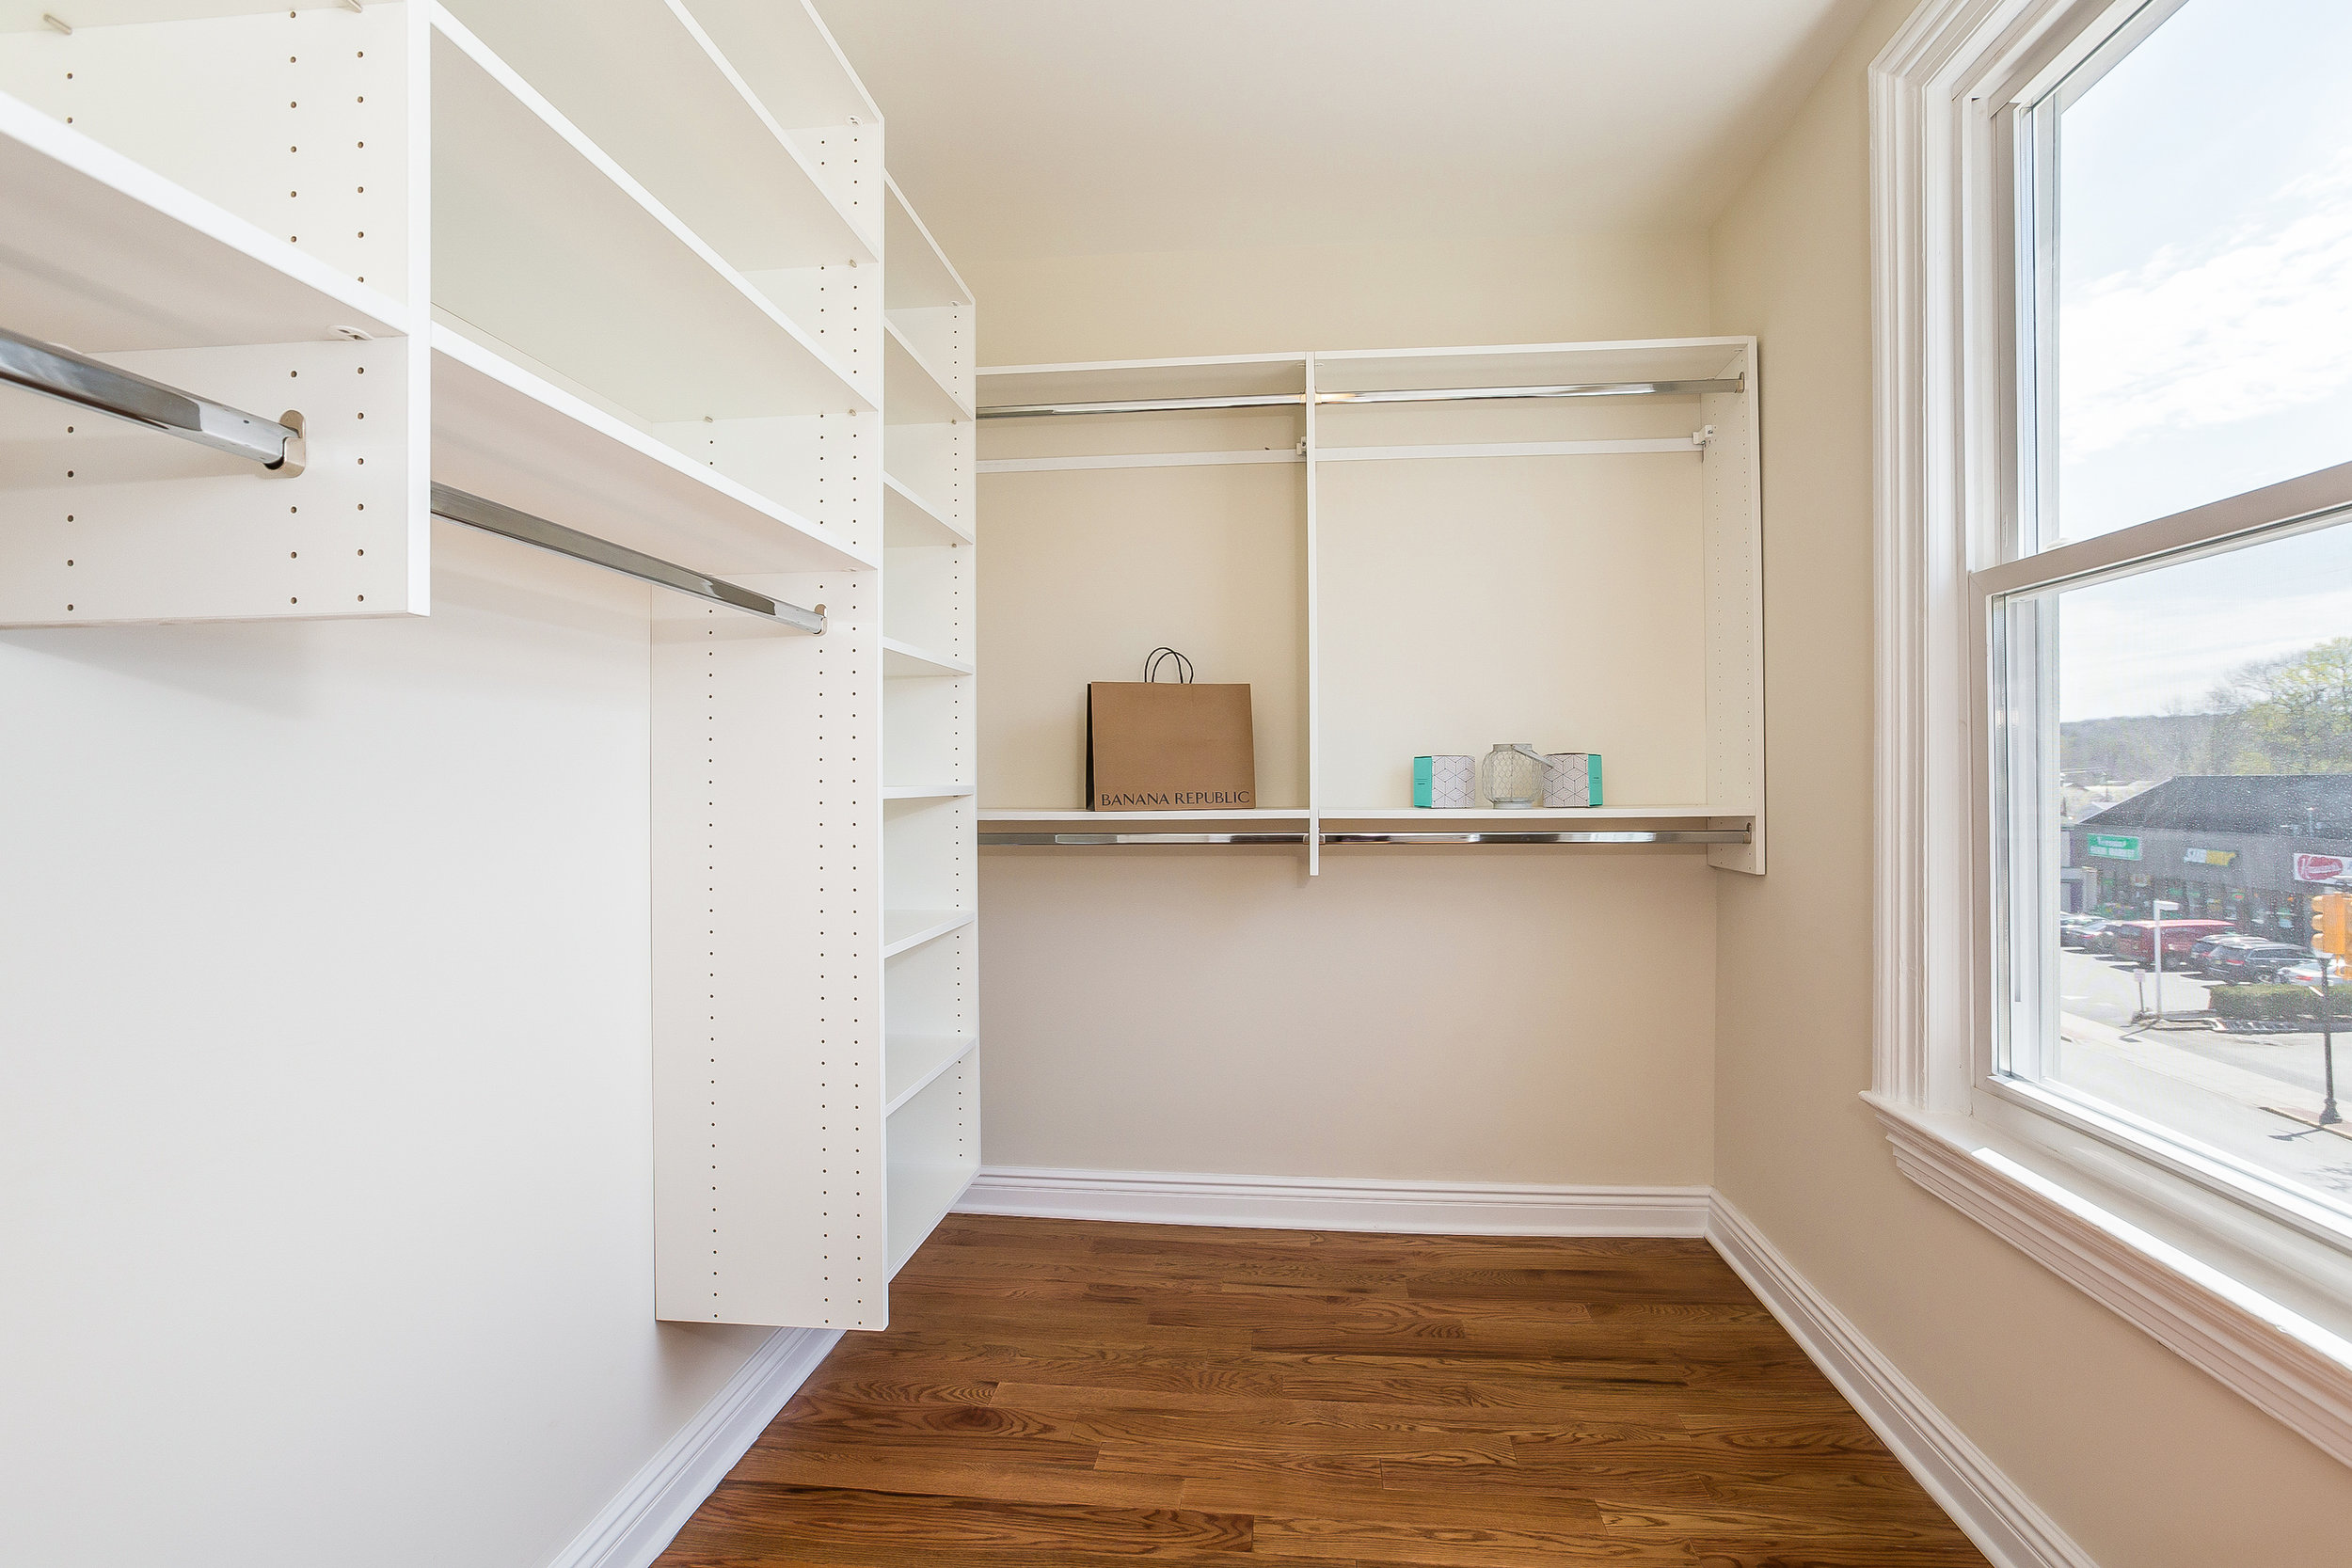 050-Walk_In_Closet-3992683-large.jpg